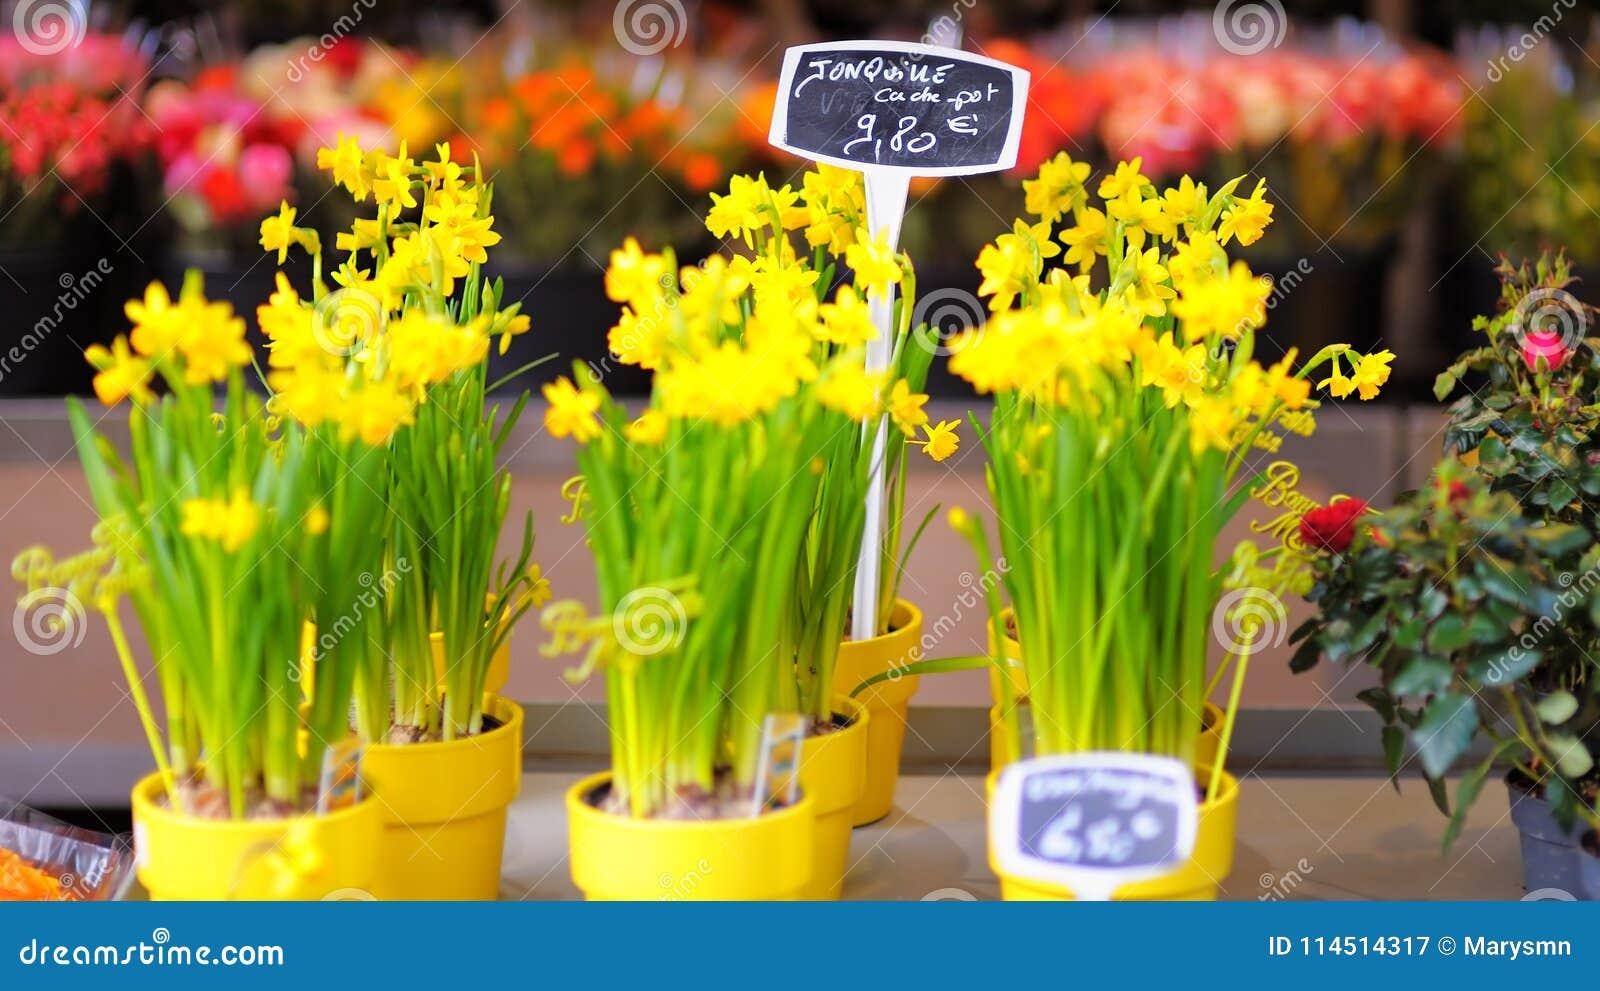 Beautiful flowers sold on outdoor flower shop stock image image of beautiful flowers sold on outdoor flower shop izmirmasajfo Gallery